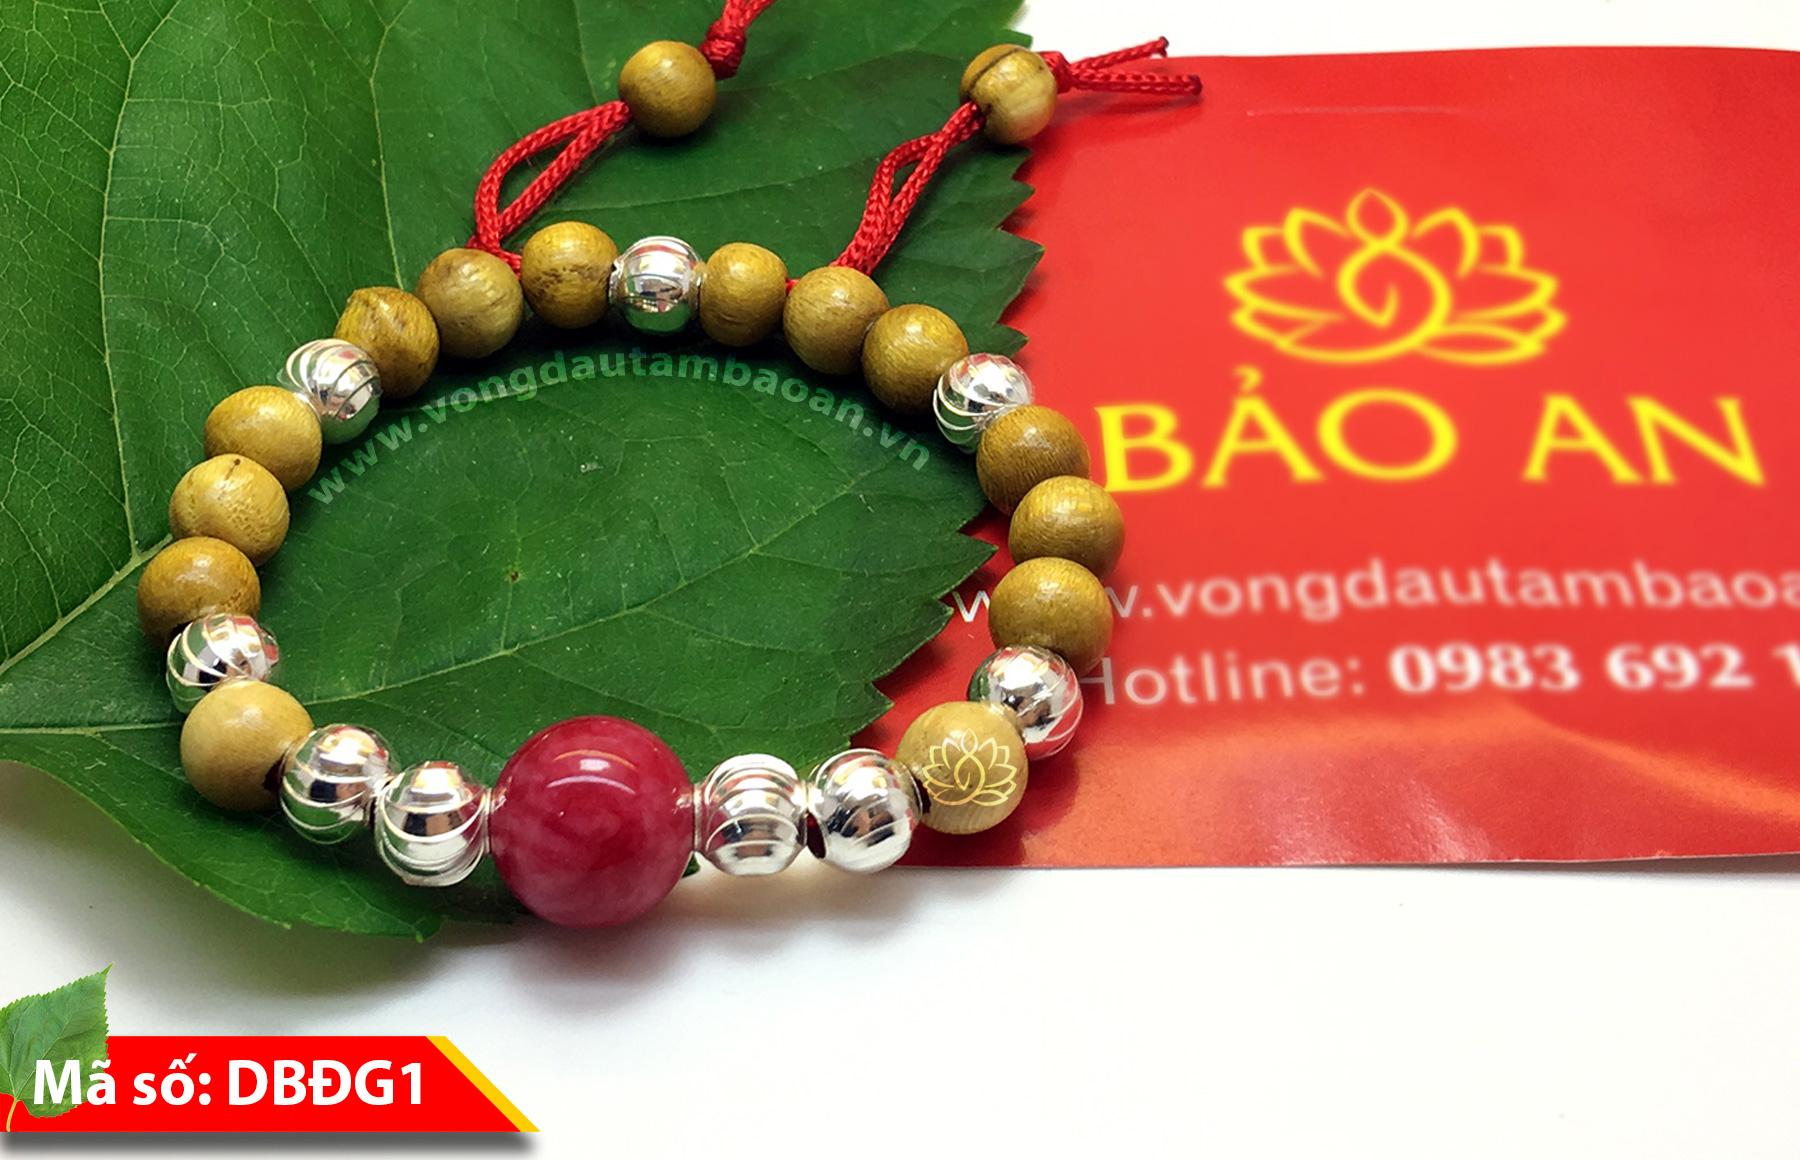 Vong-dau-tam-DBDG1-A